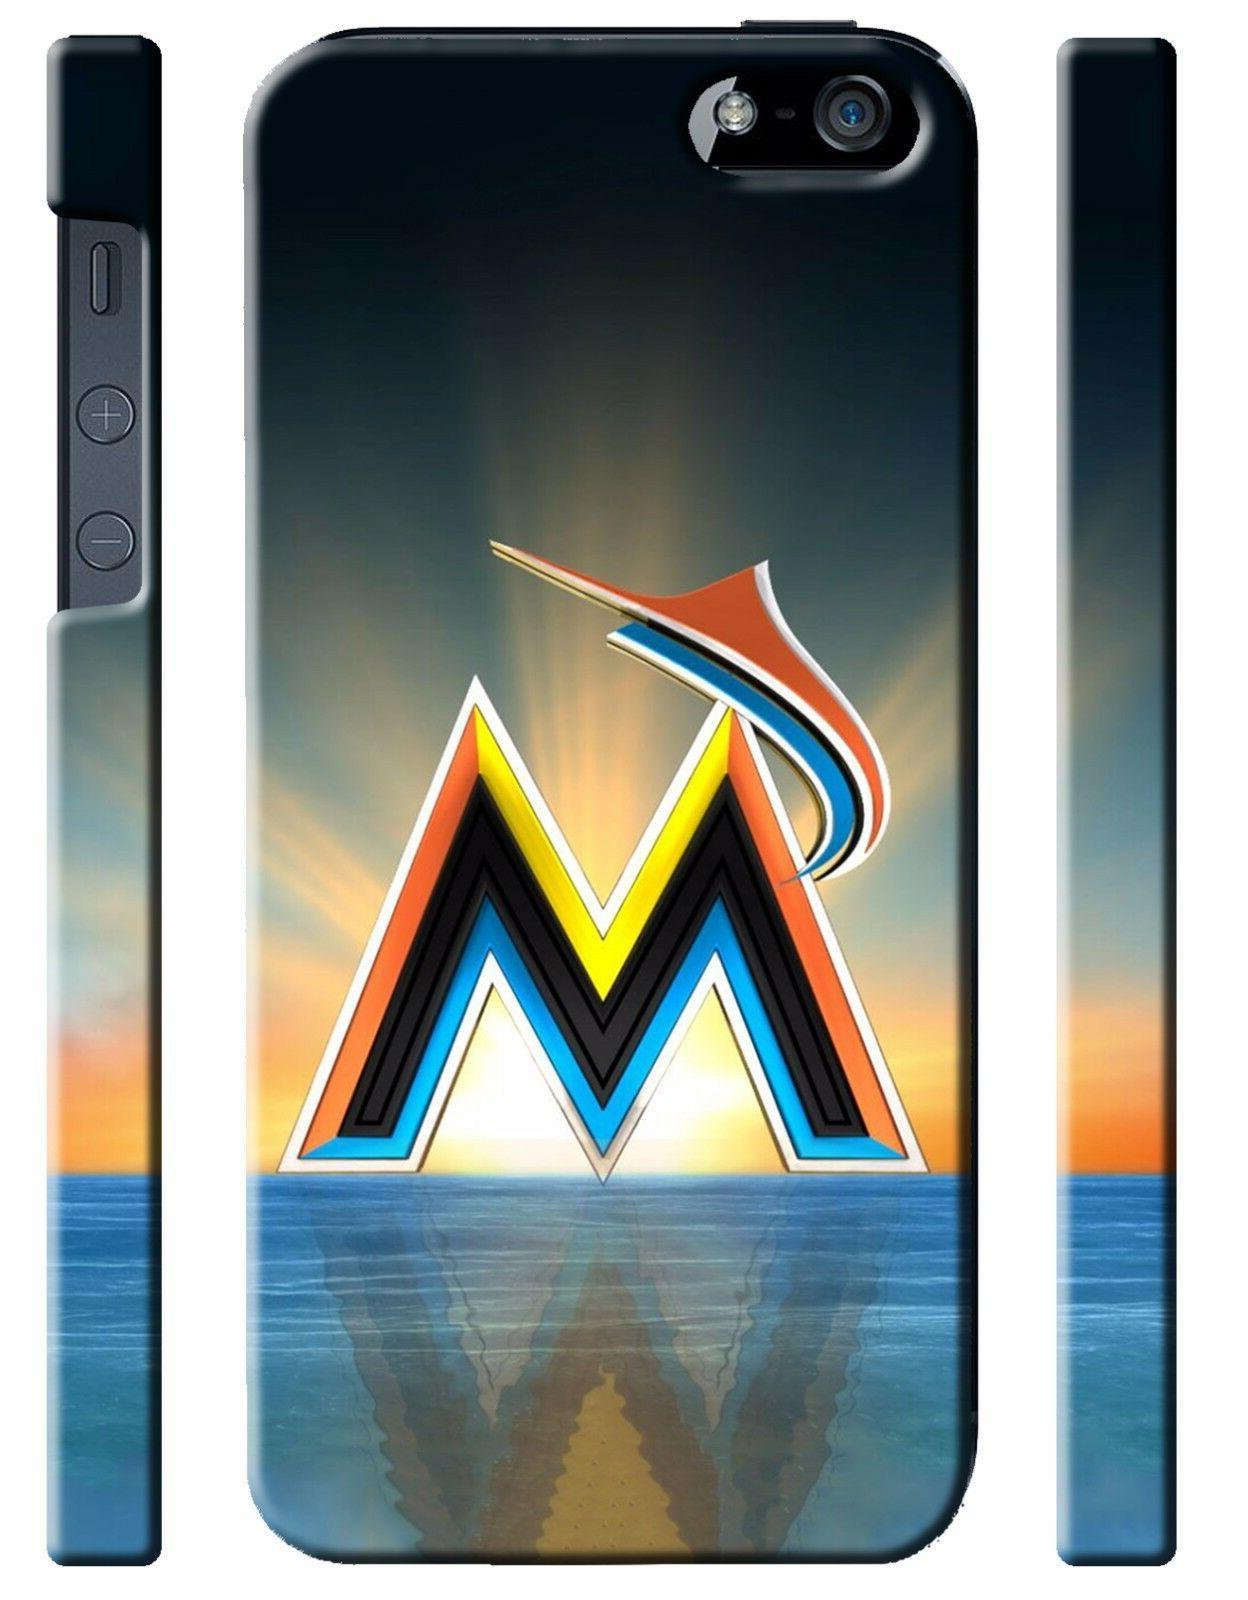 miami marlins baseball iphone 4s 5 5s